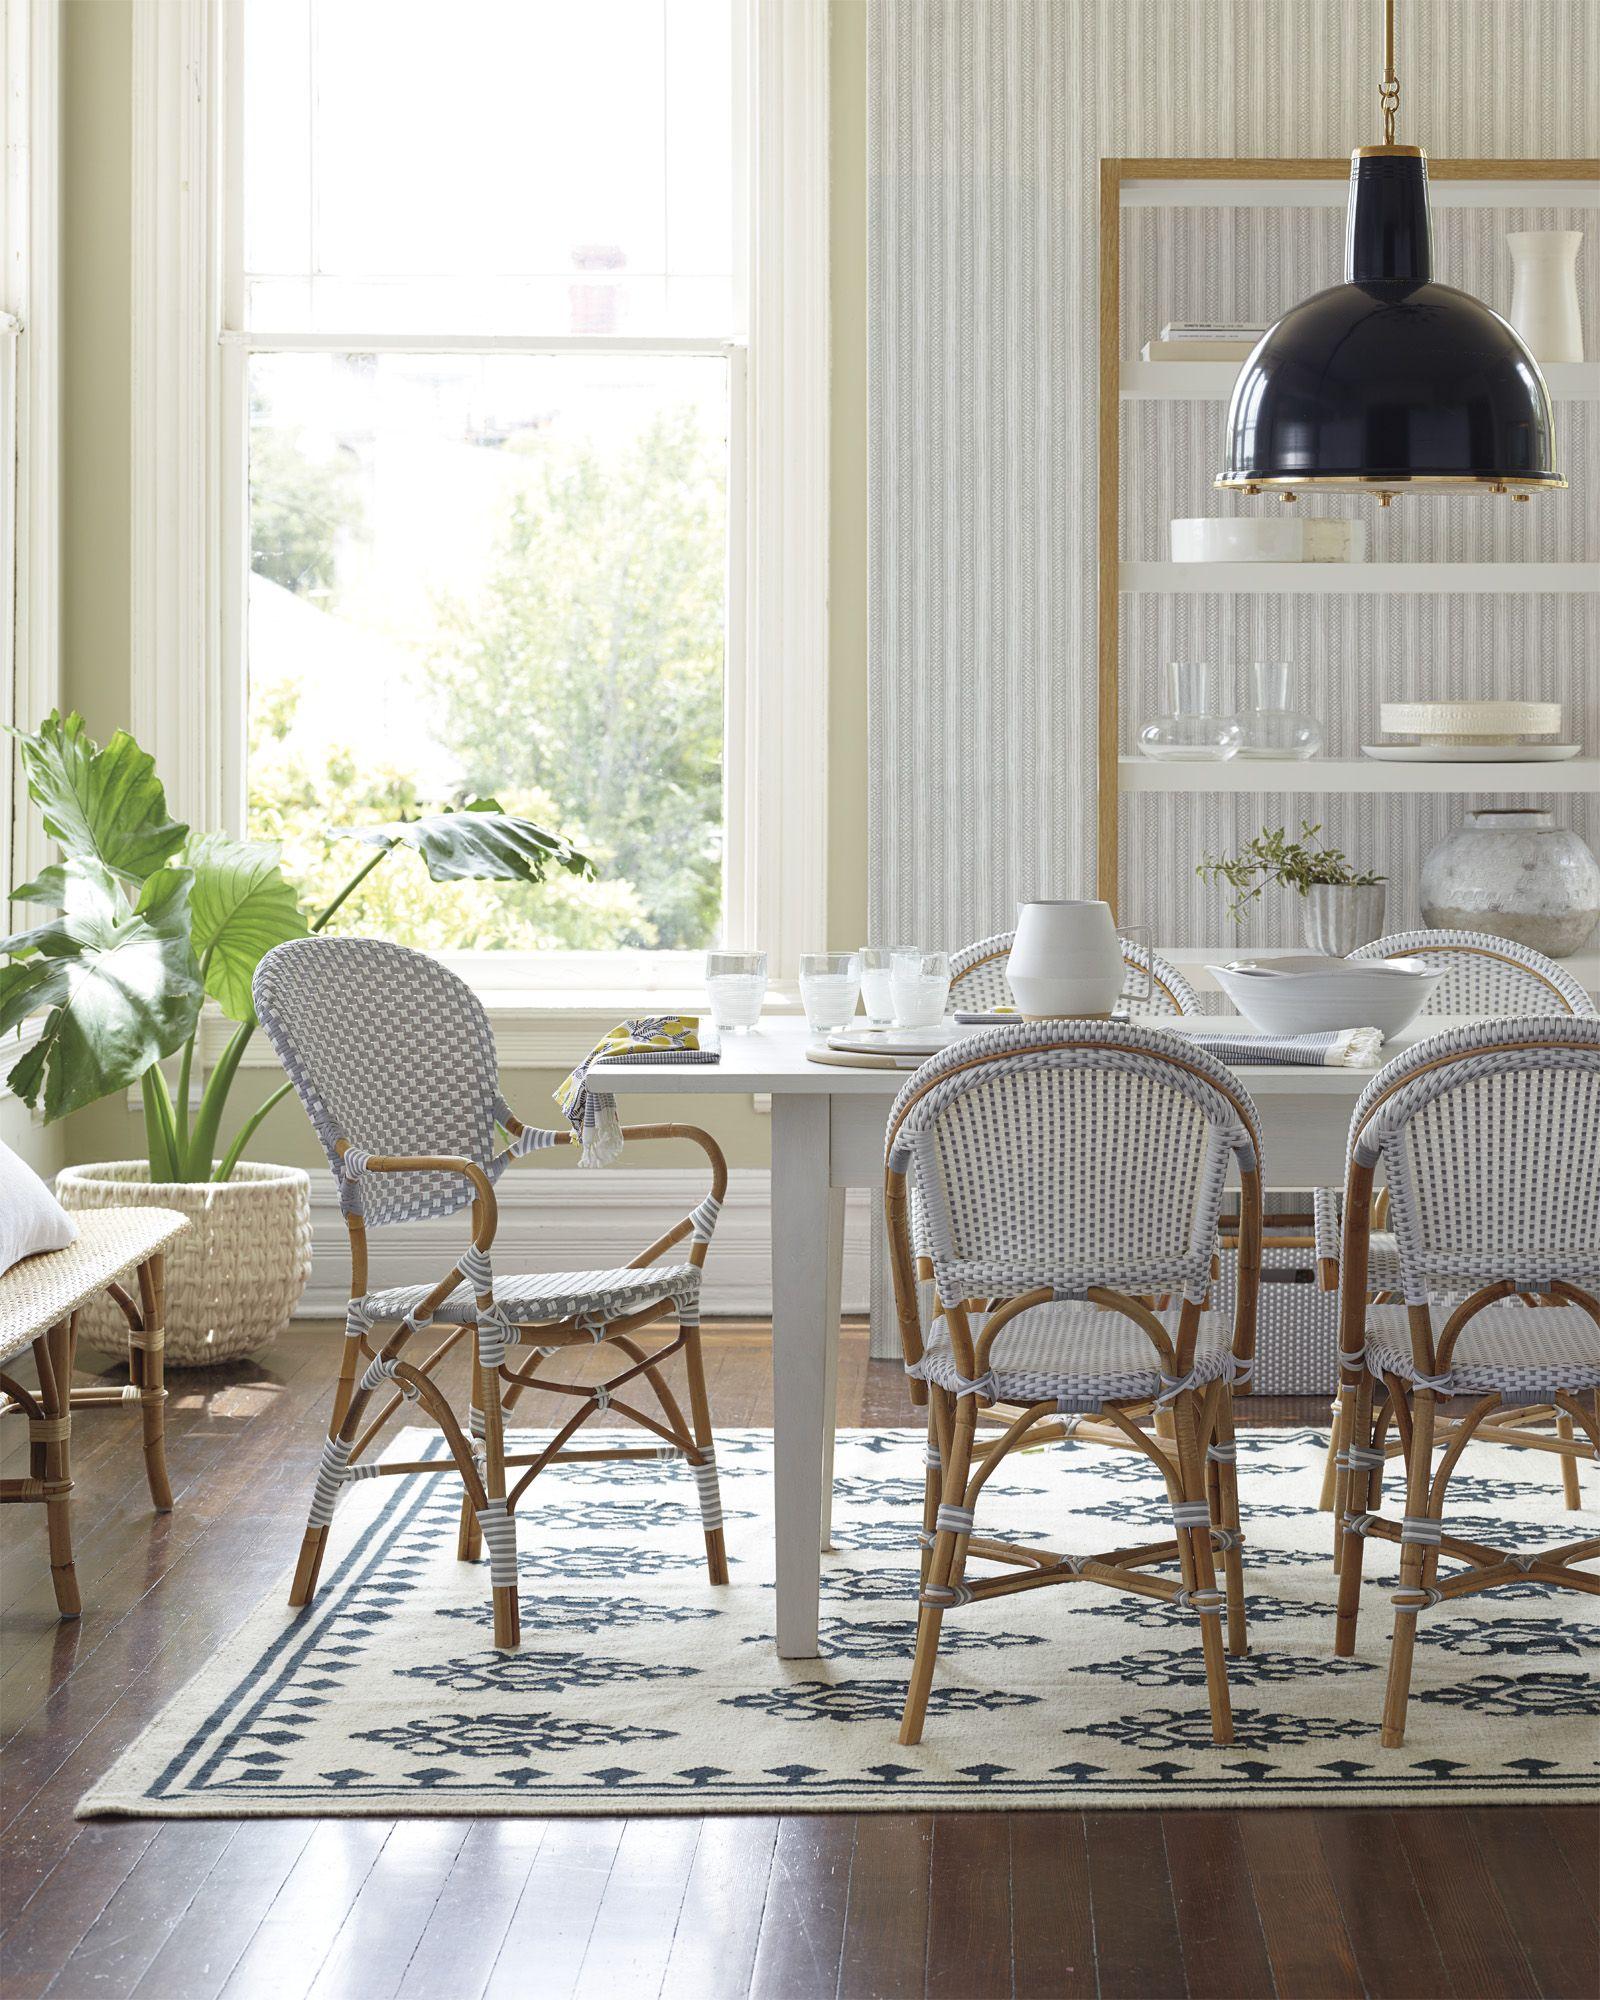 The Natural Dining Room | Riviera Chairs And Marina Medallion Kilim Via  Serena U0026 Lily